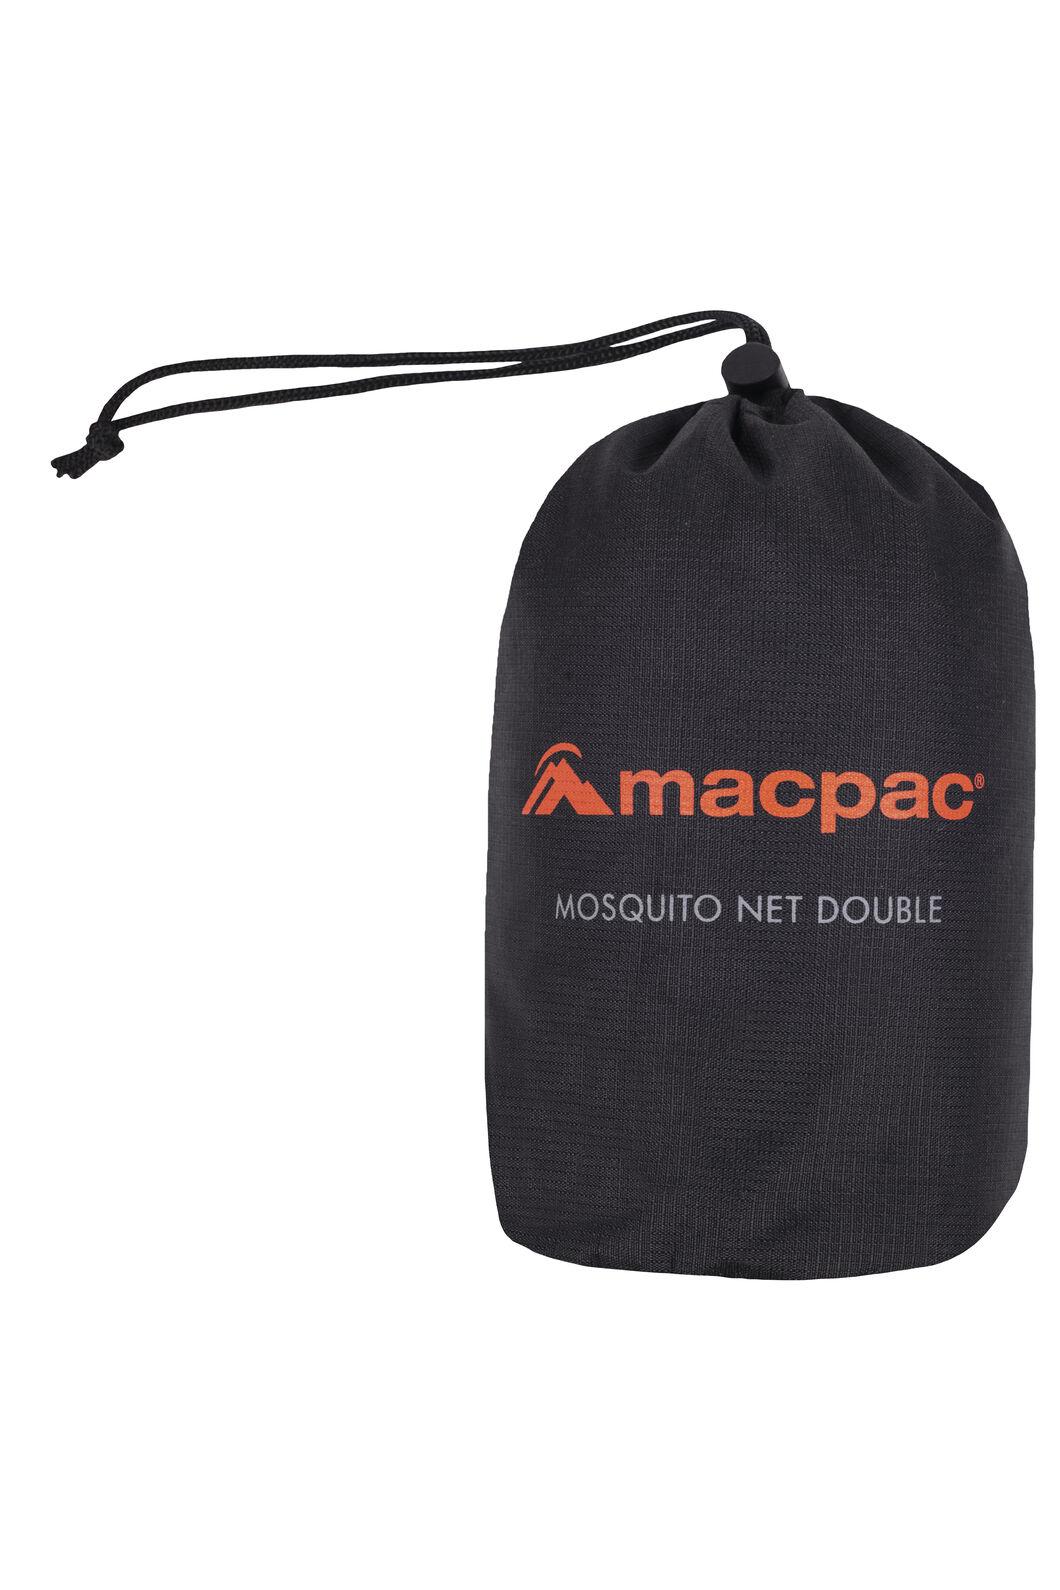 Macpac Mosquito Net Double, Black, hi-res